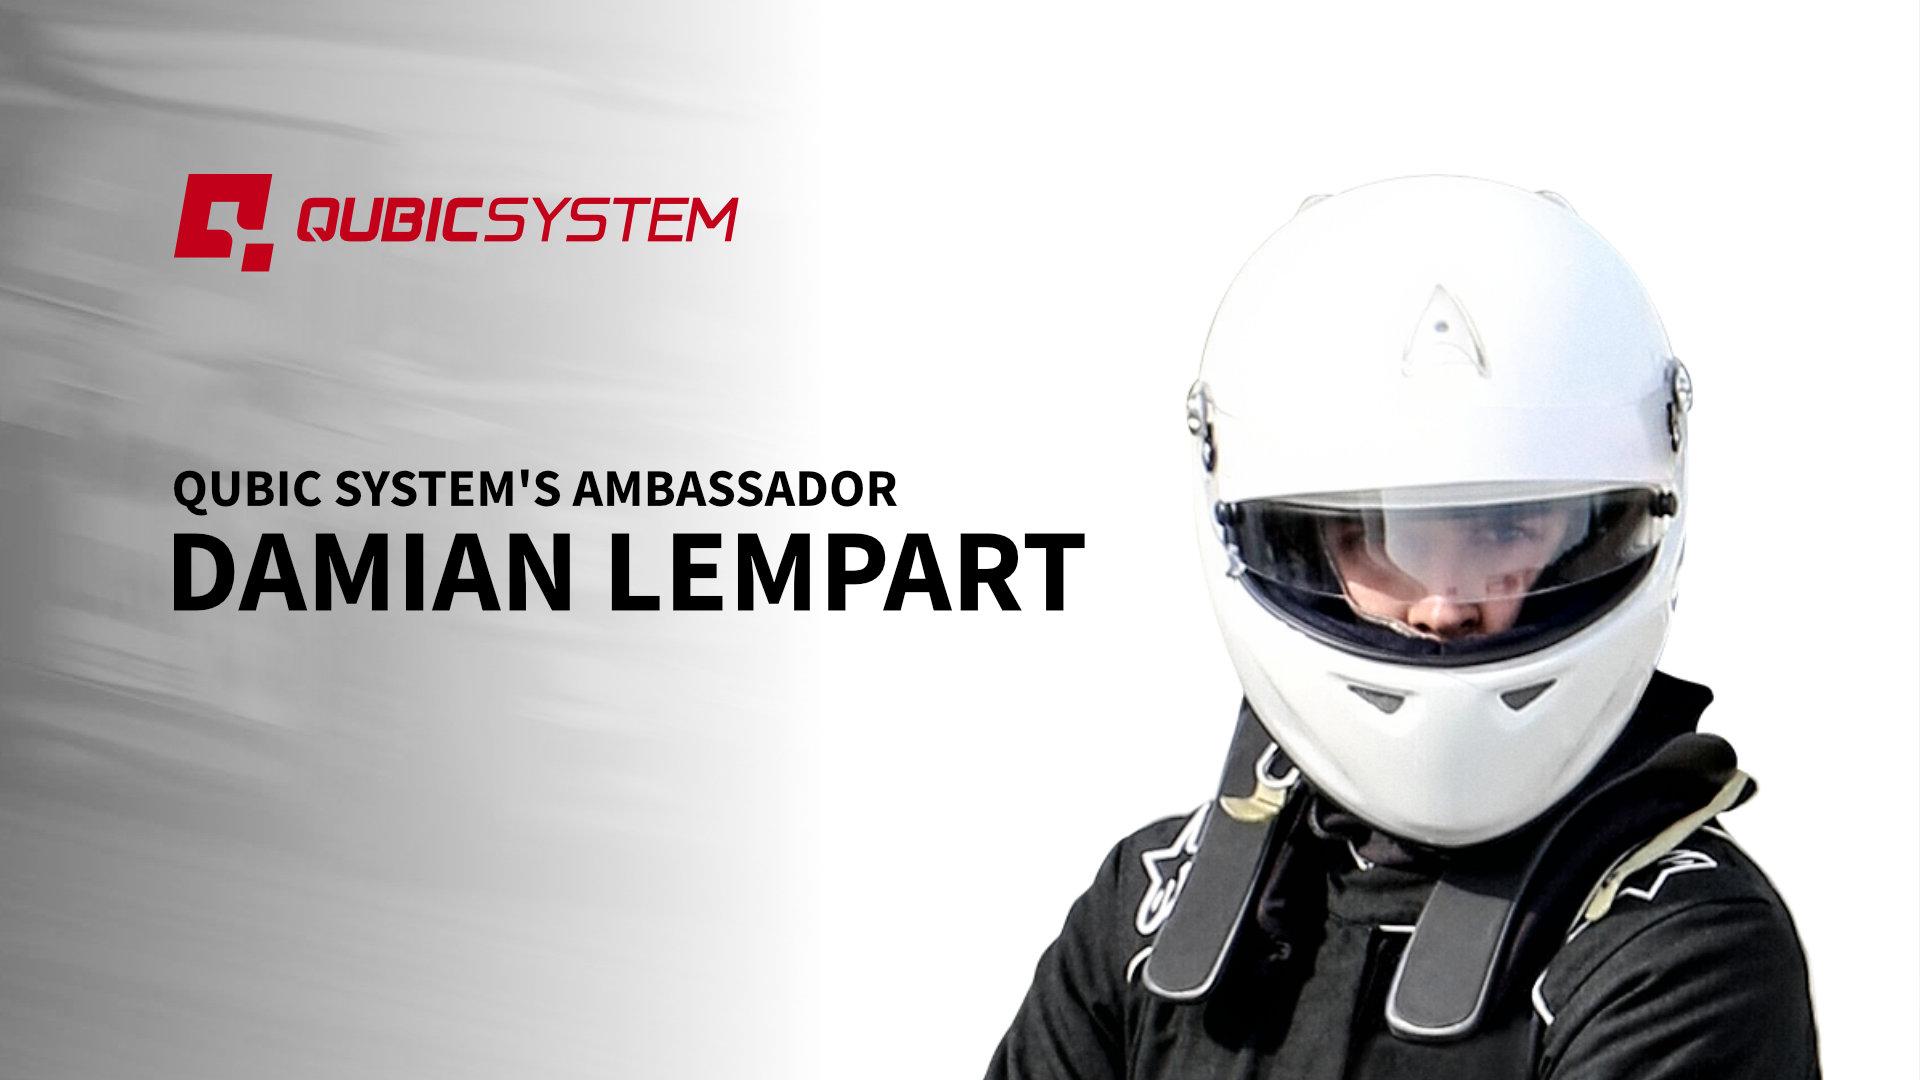 Damian Lempart